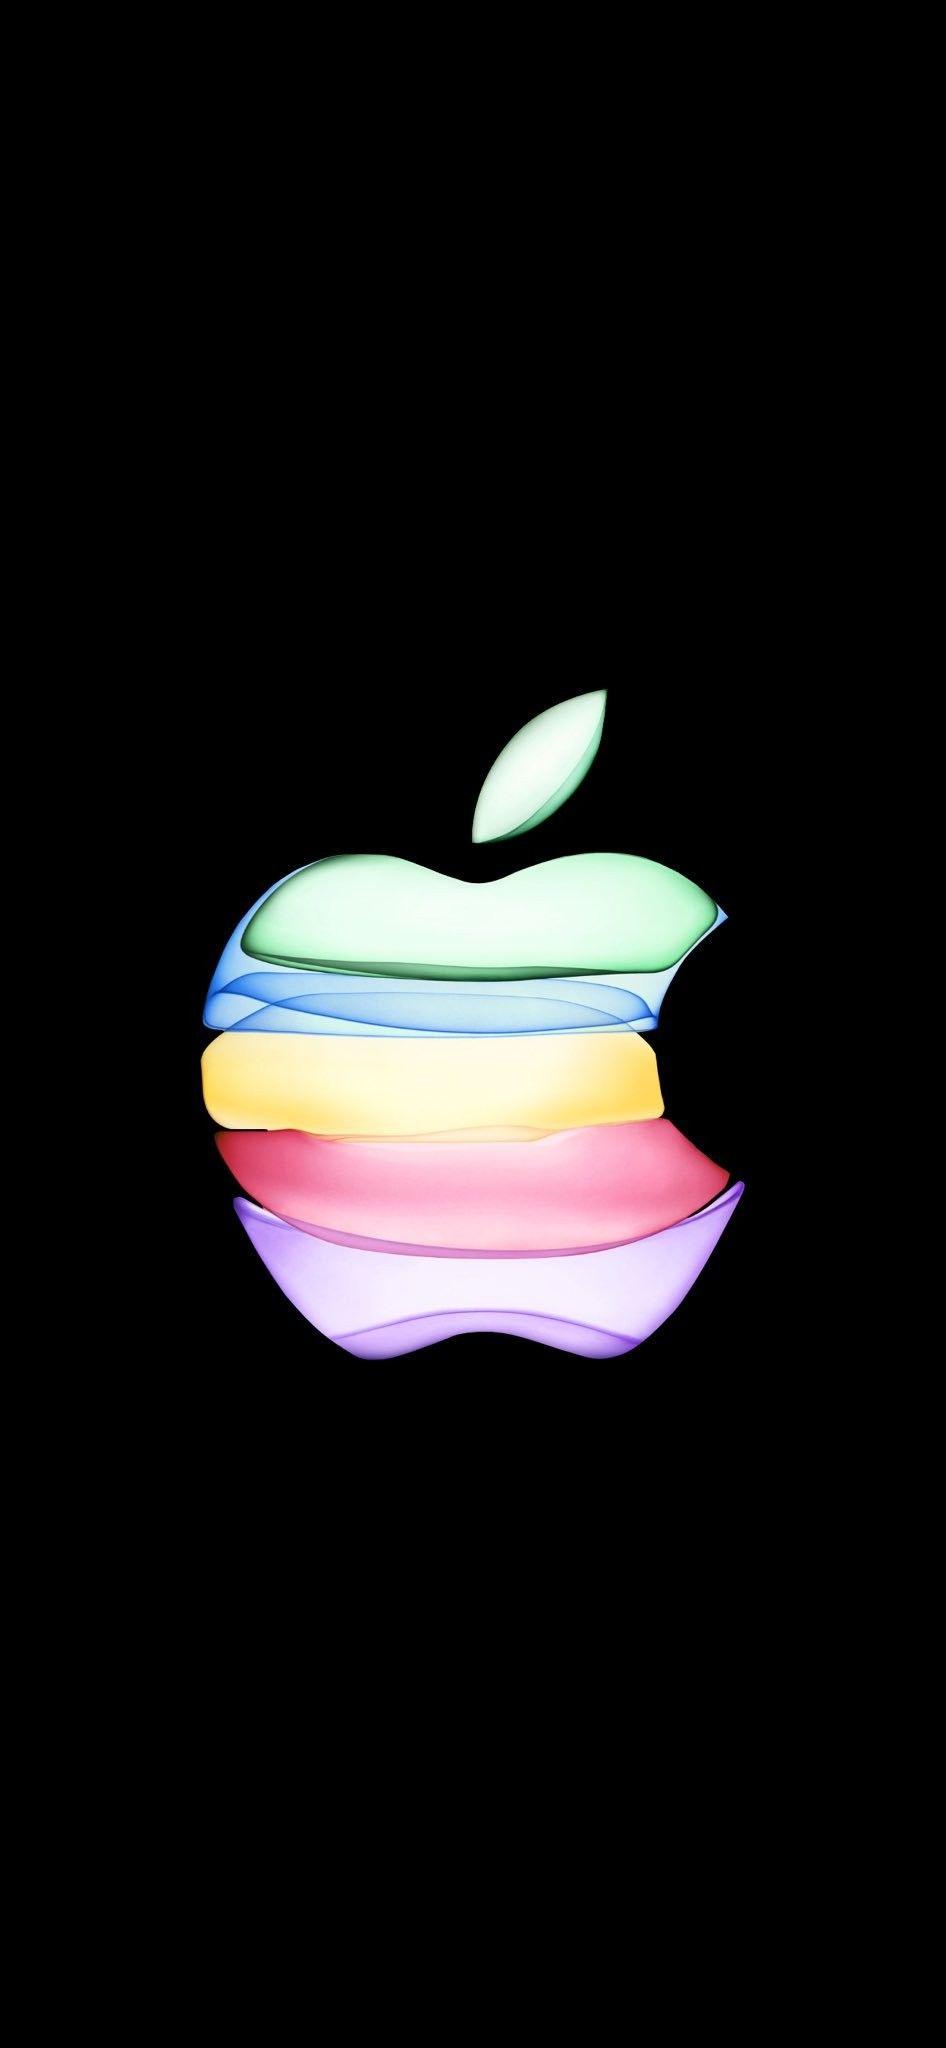 Pin By Linda Calaway Morgan On Apple Logo Apple Logo Wallpaper Iphone Apple Wallpaper Iphone Apple Logo Wallpaper